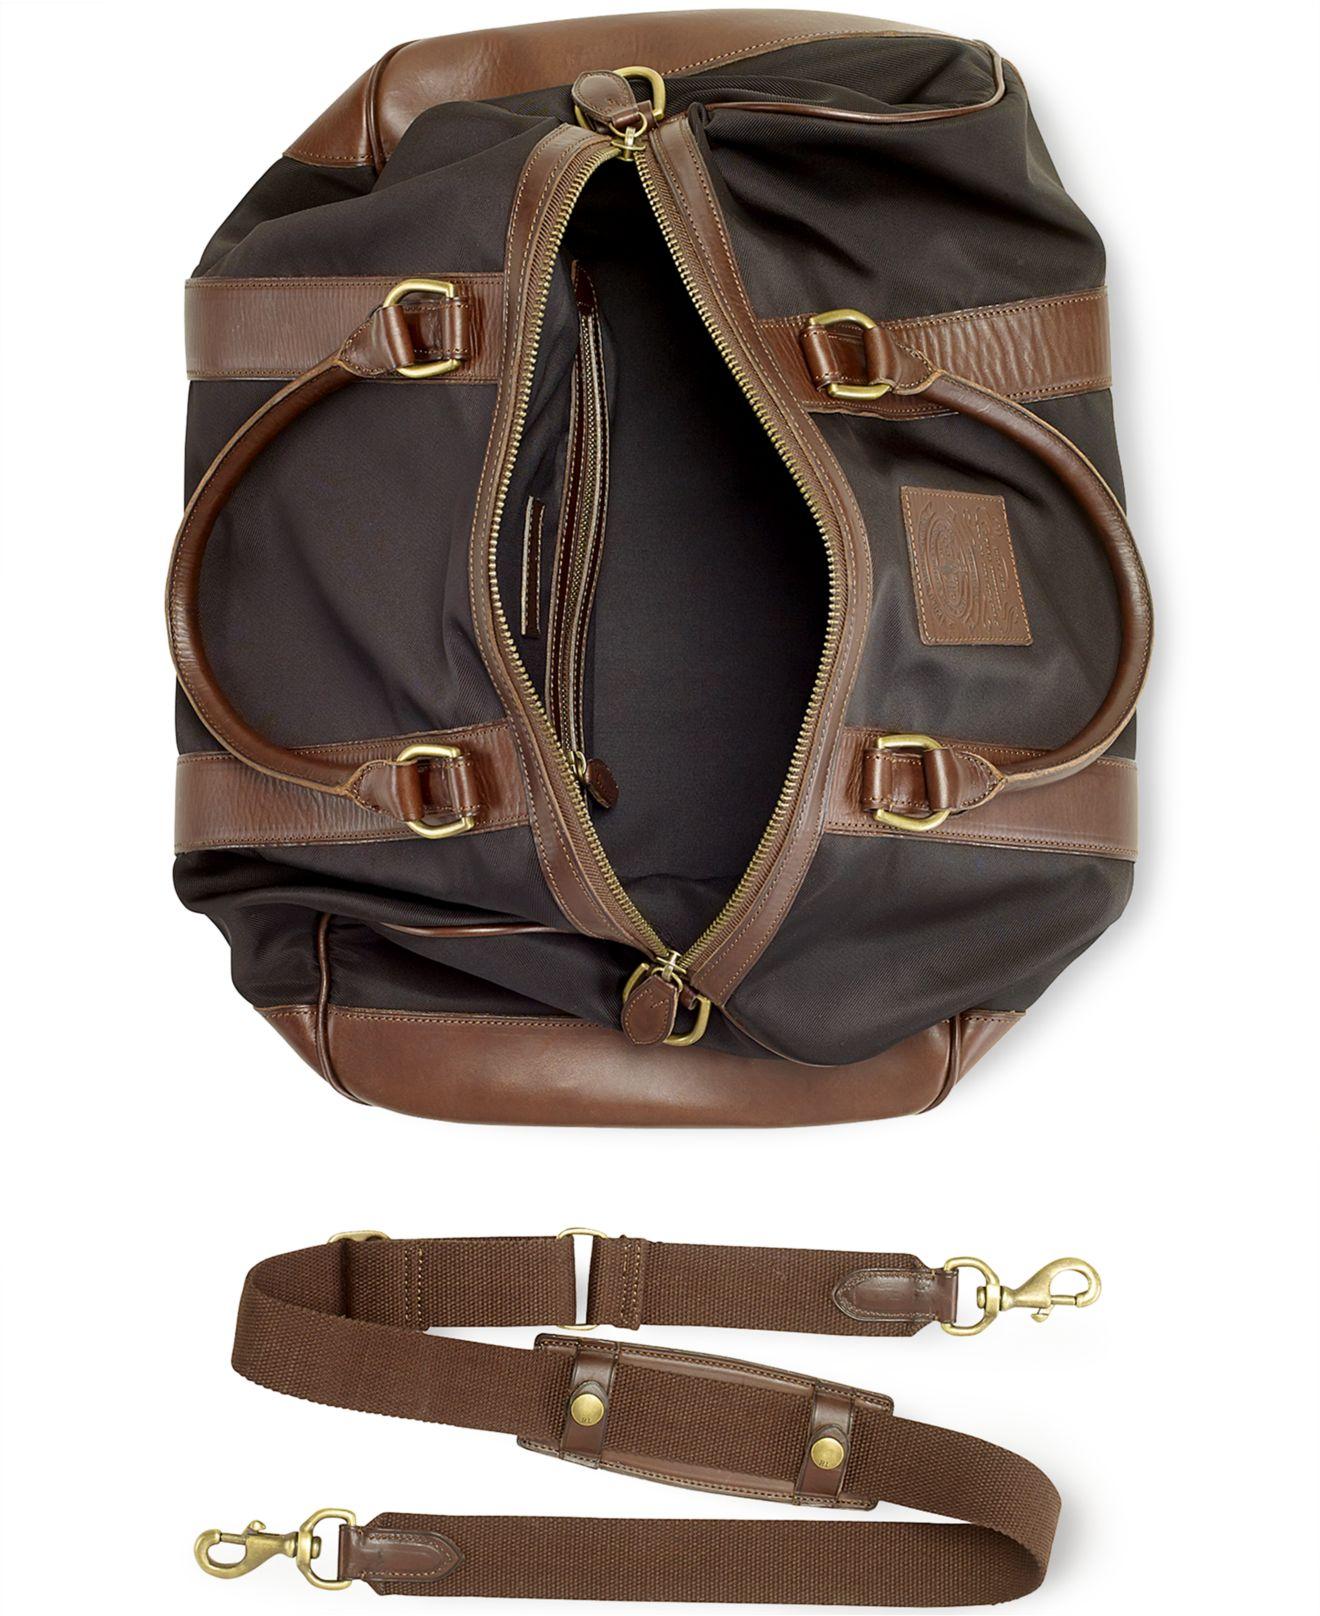 a4c2b426f027 ... purchase lyst polo ralph lauren medium nylon duffel bag in black for men  46bcd a2653